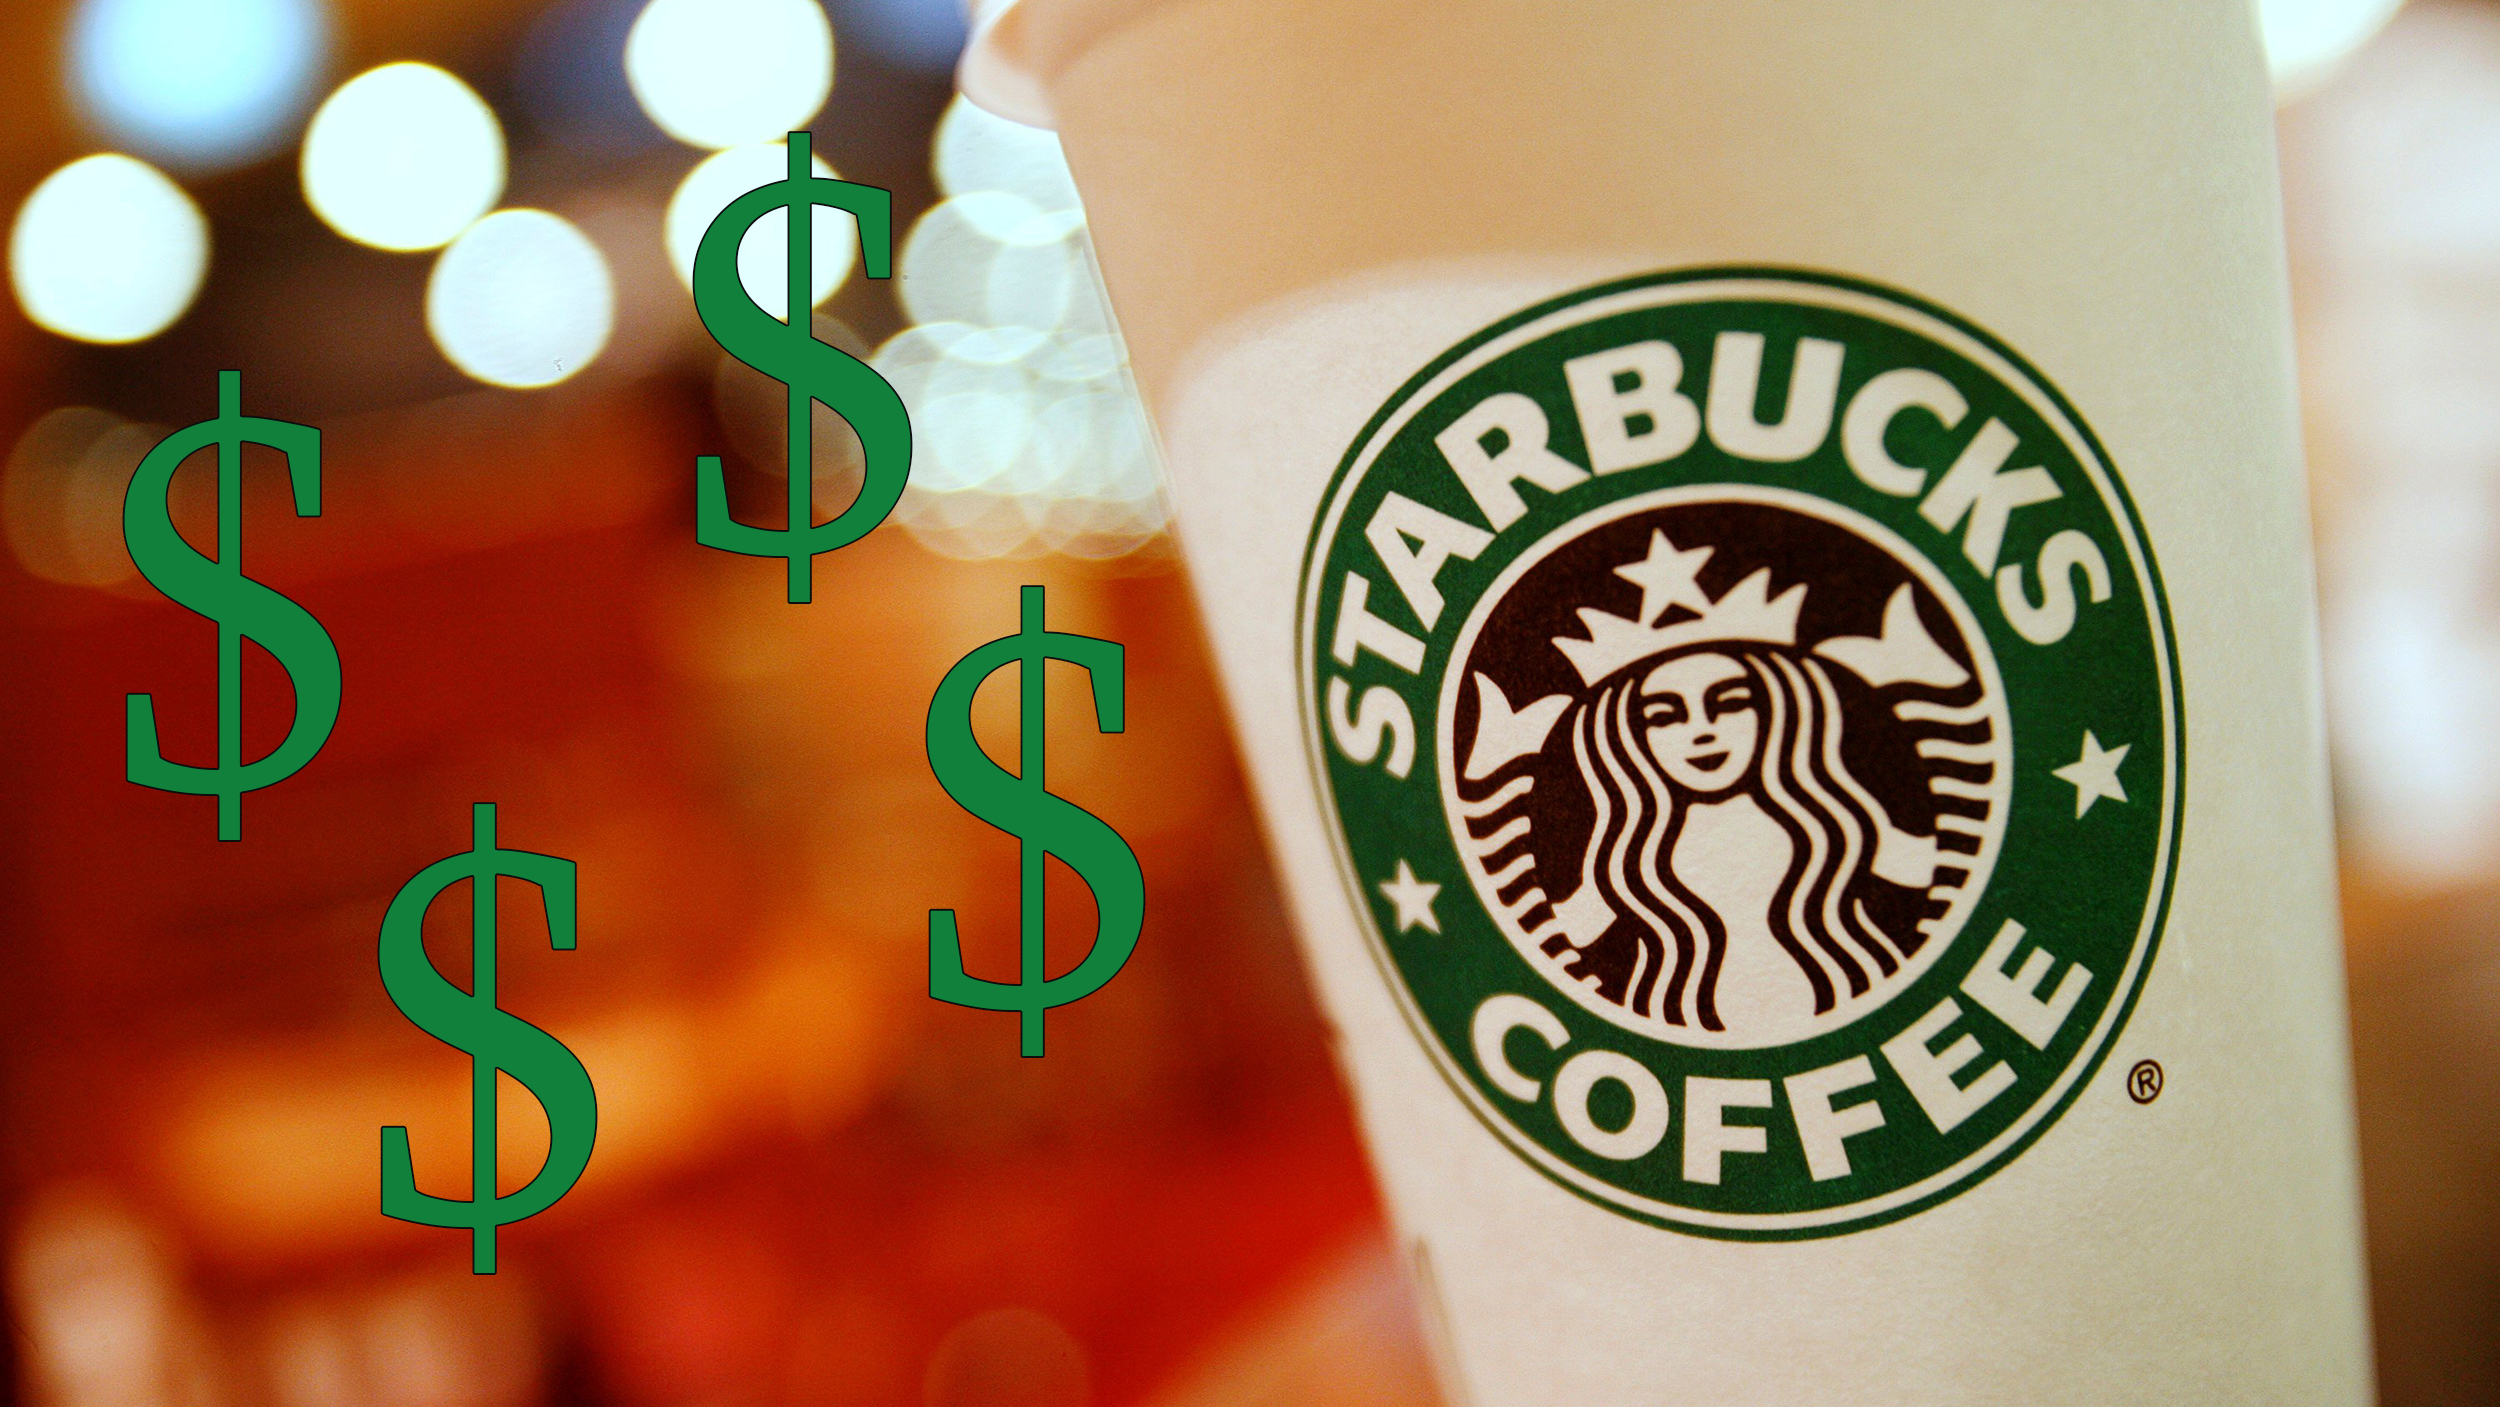 Starbucks Raises Price Of Brewed Coffee Across The Us